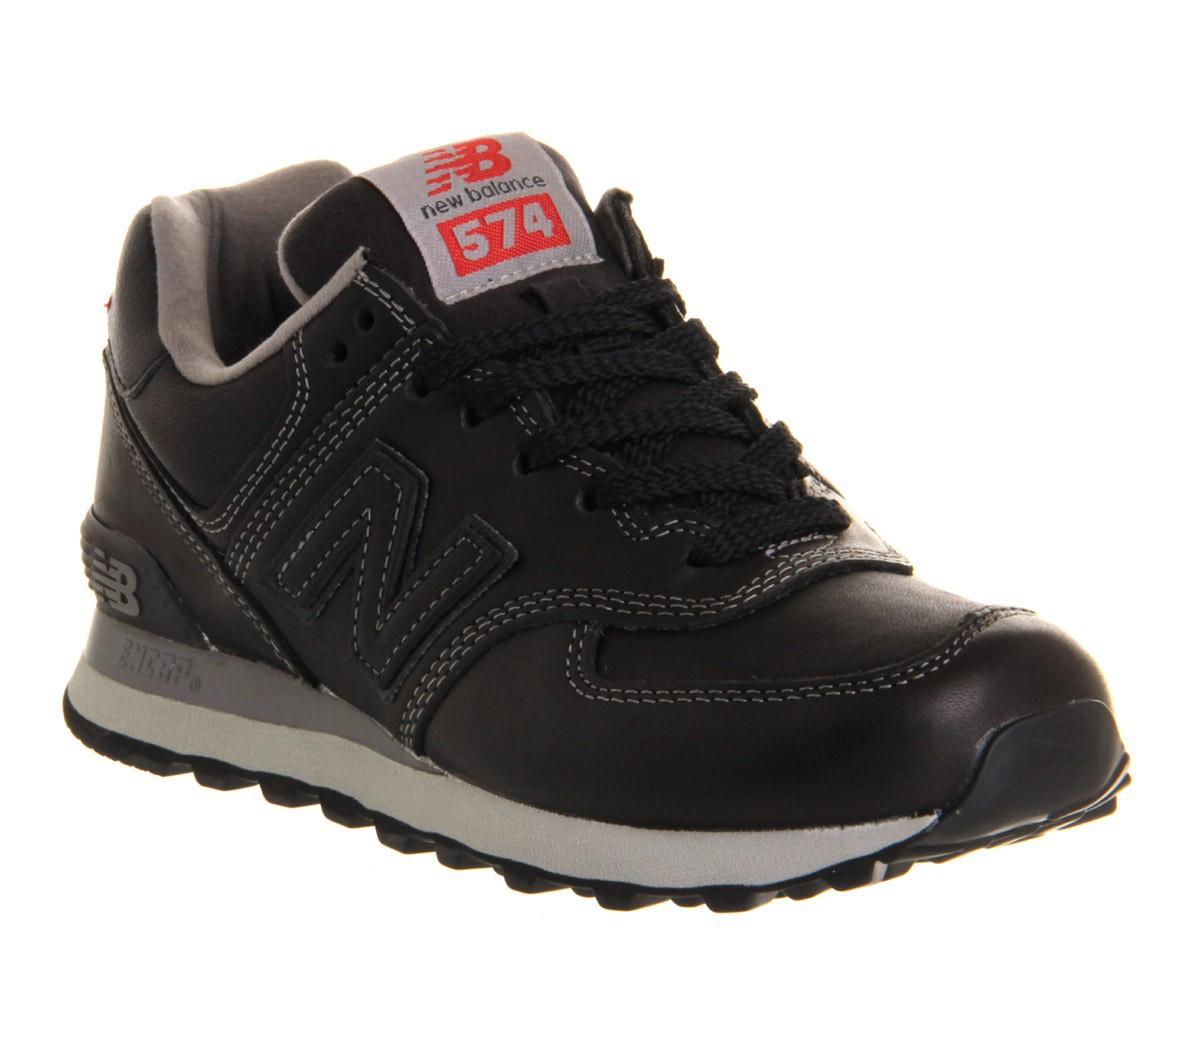 new balance 574 cuir noir homme